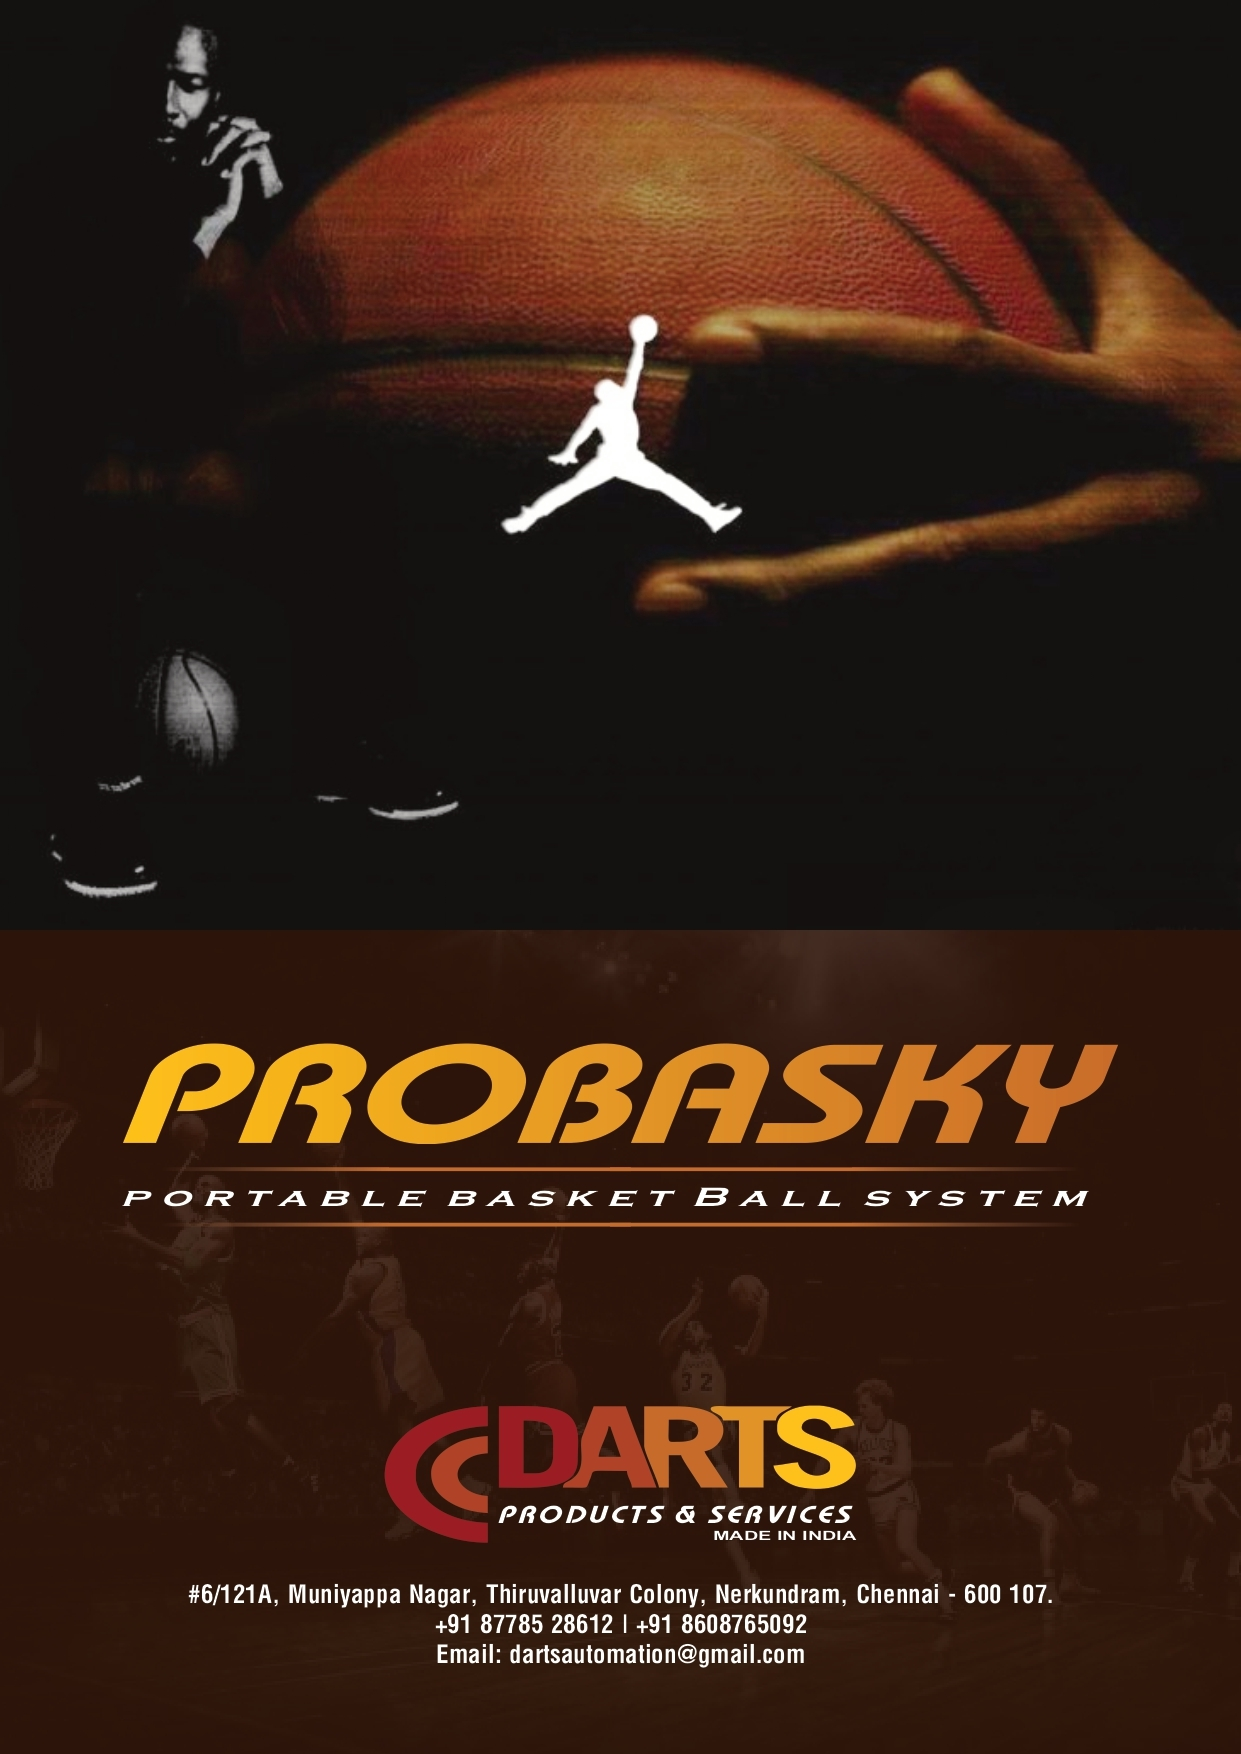 PROBASKY -PORTABLE BASKETBALL UNIT